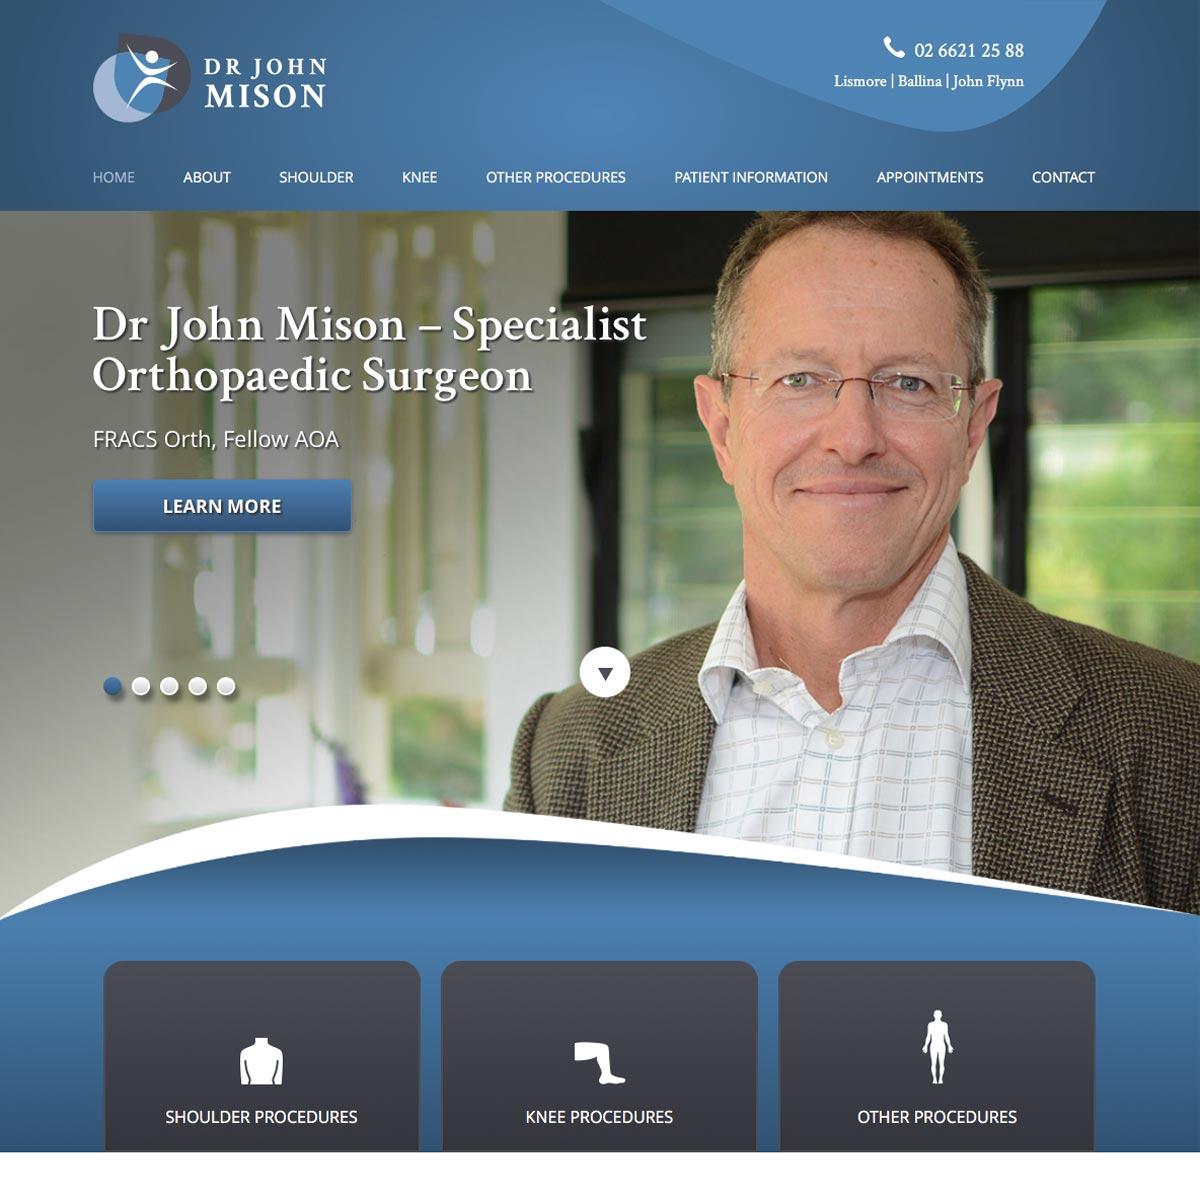 Dr John Mison Homepage